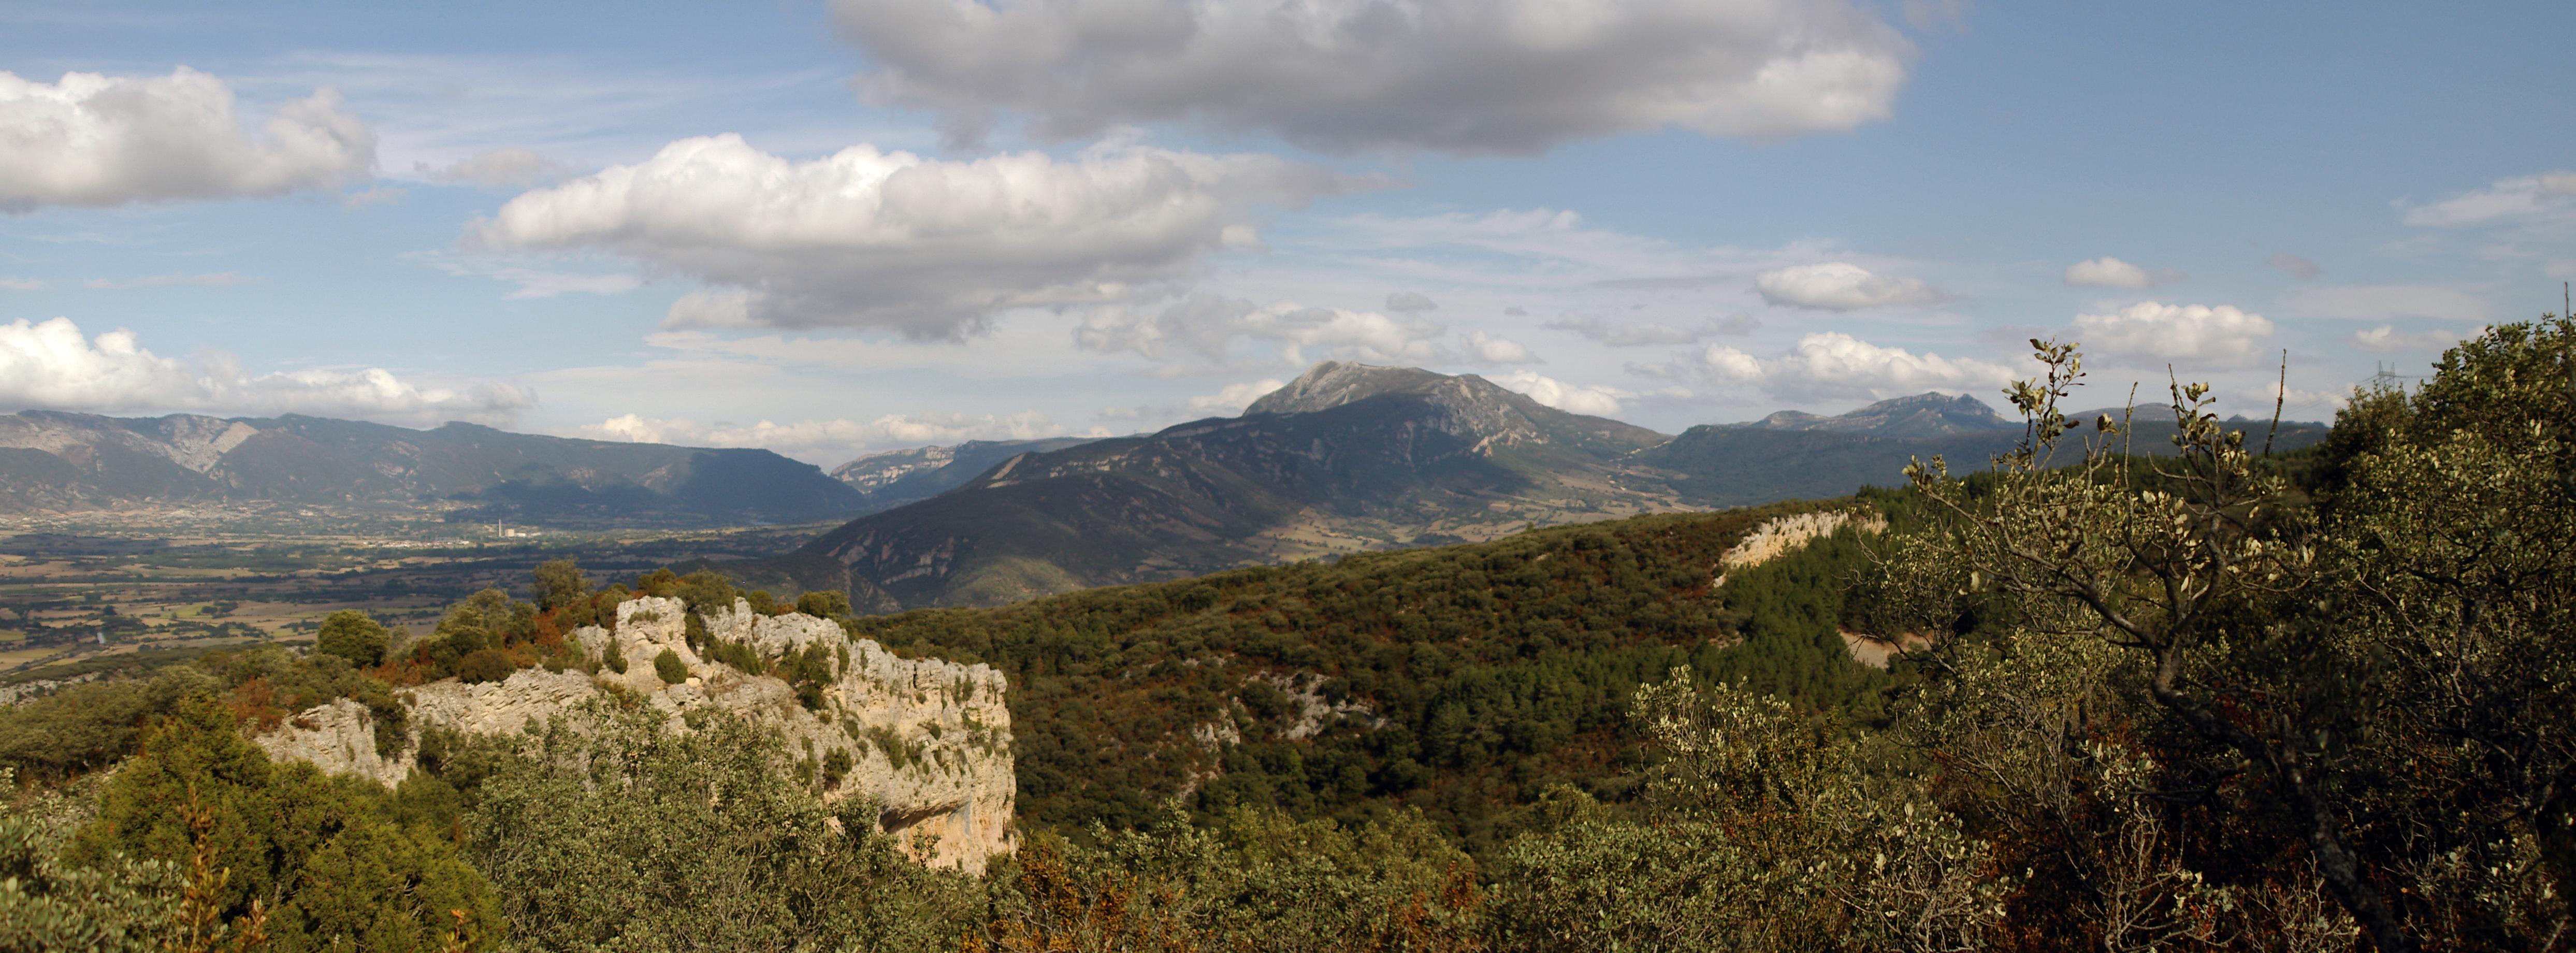 Parque Natural 'Montes Obarenes-San Zadornil'